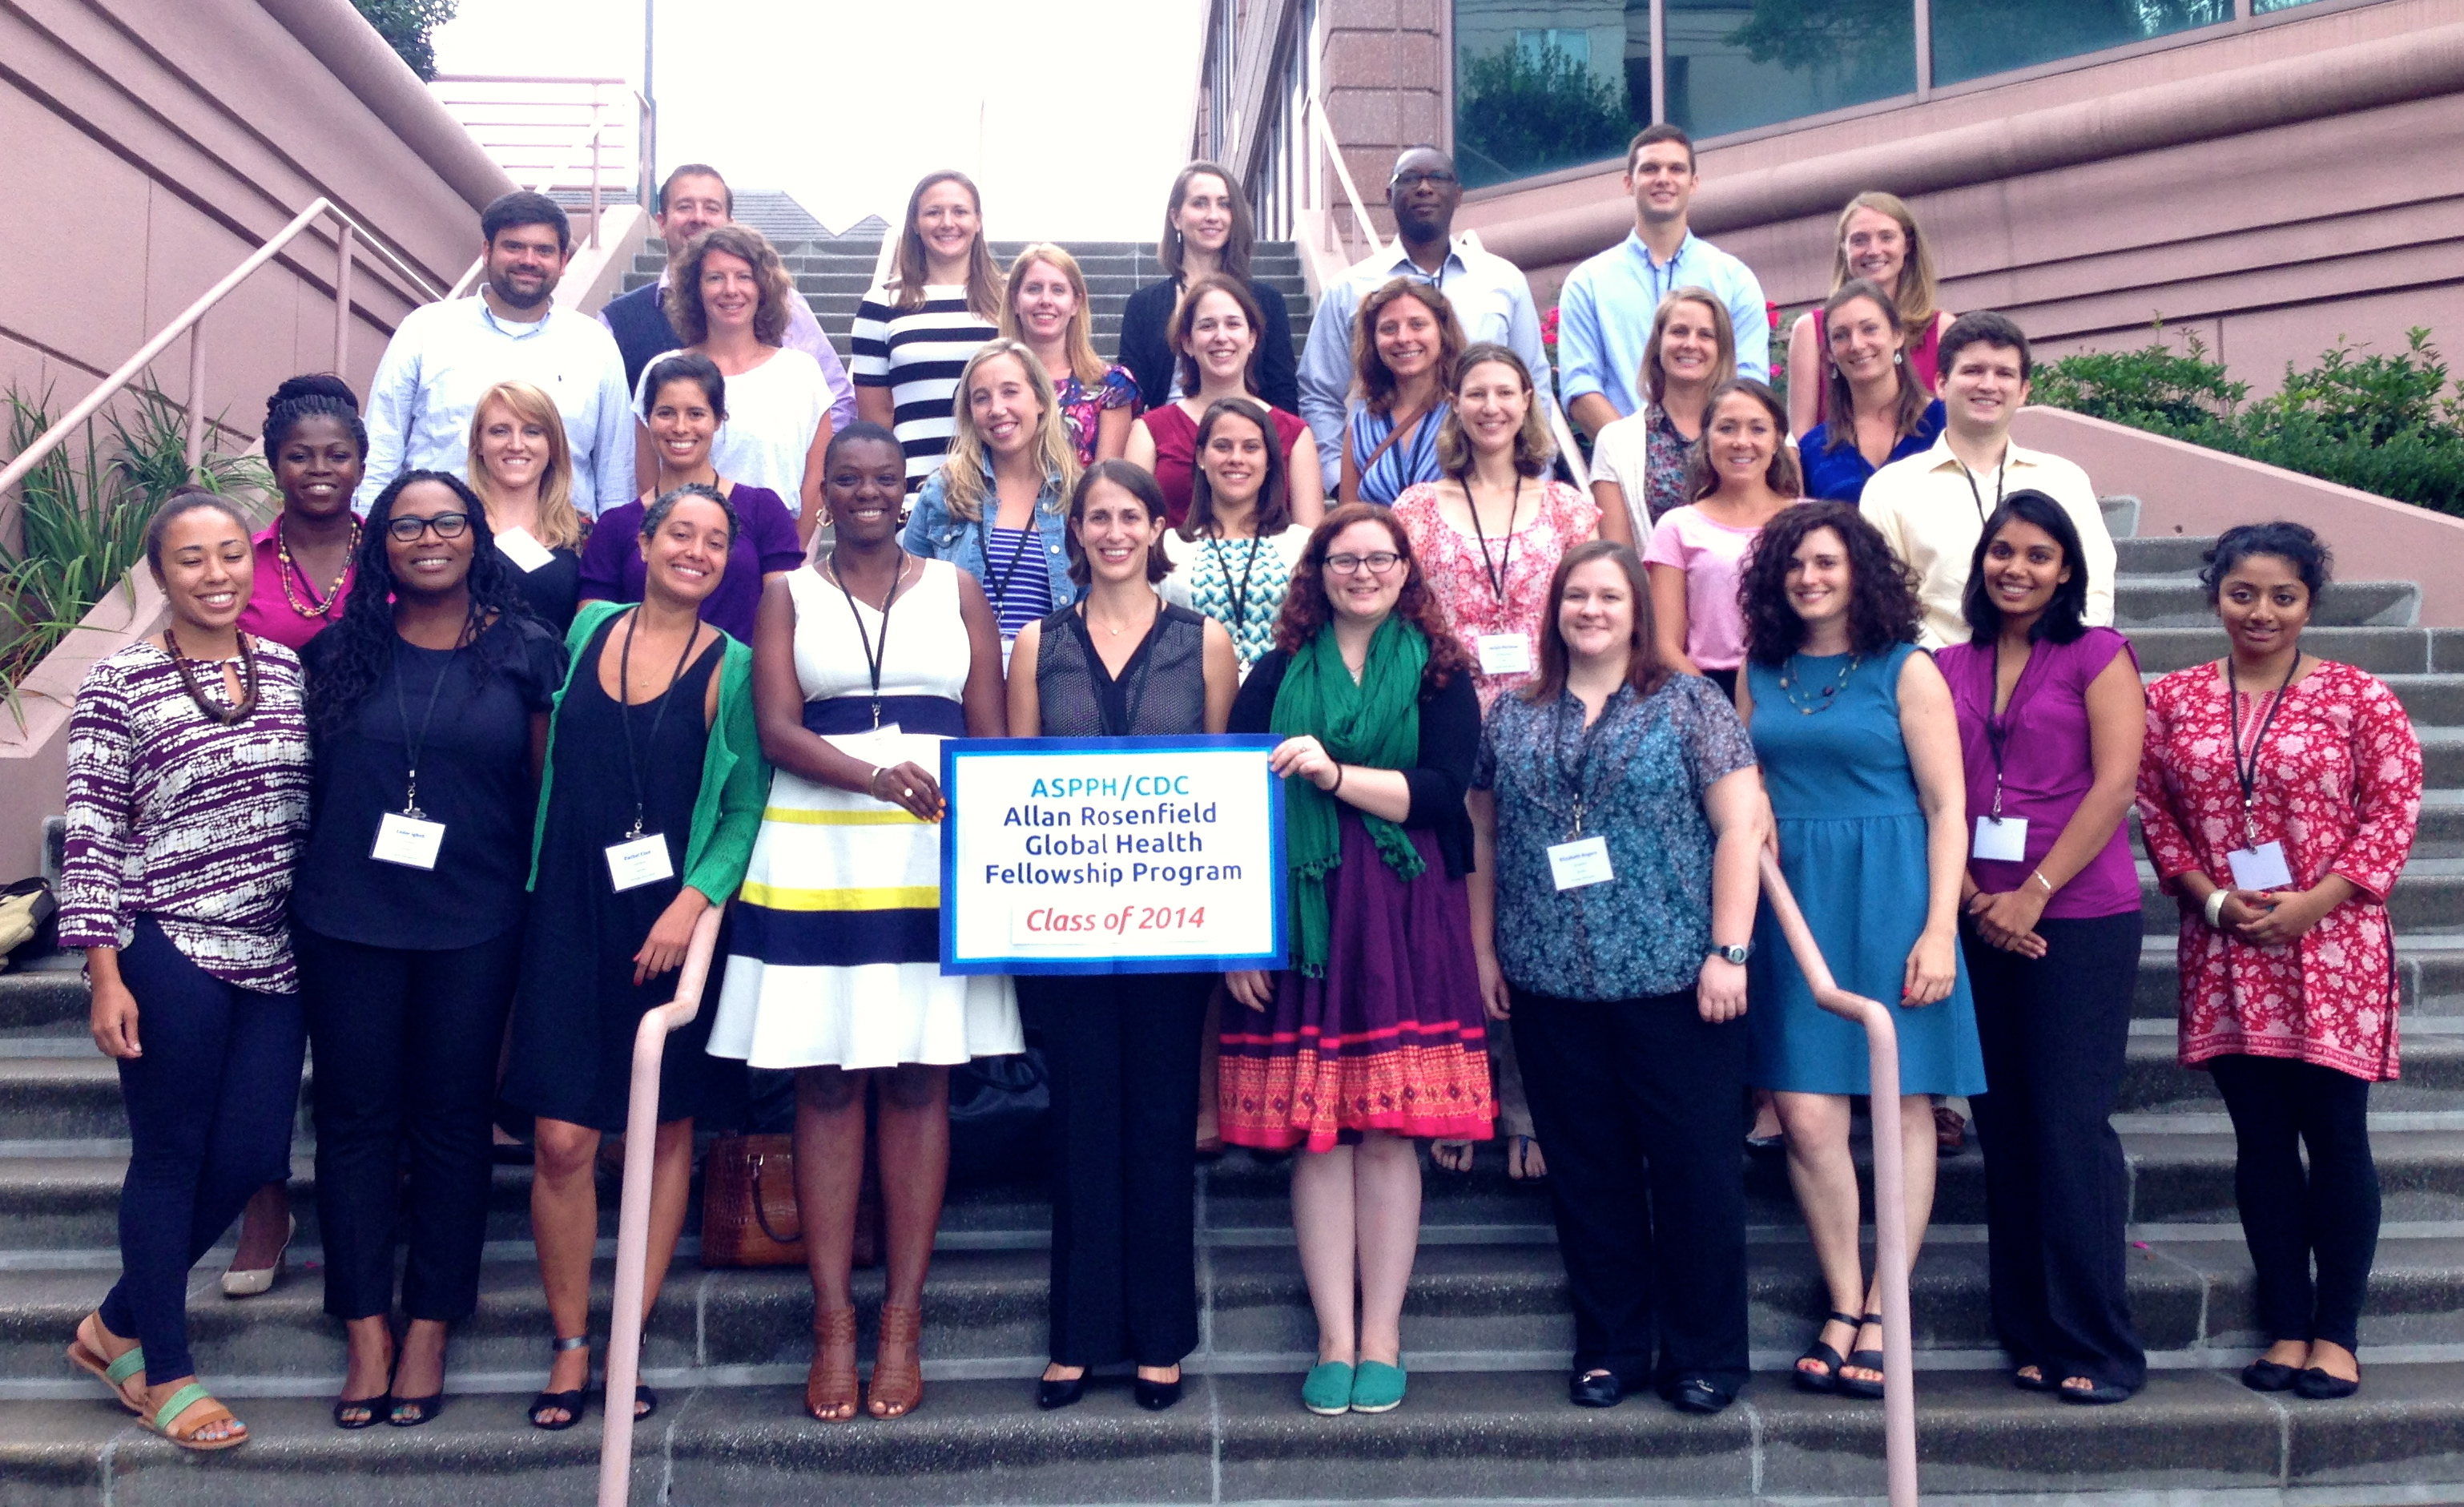 The ASPPH/CDC Allan Rosenfield Global Health Fellowship